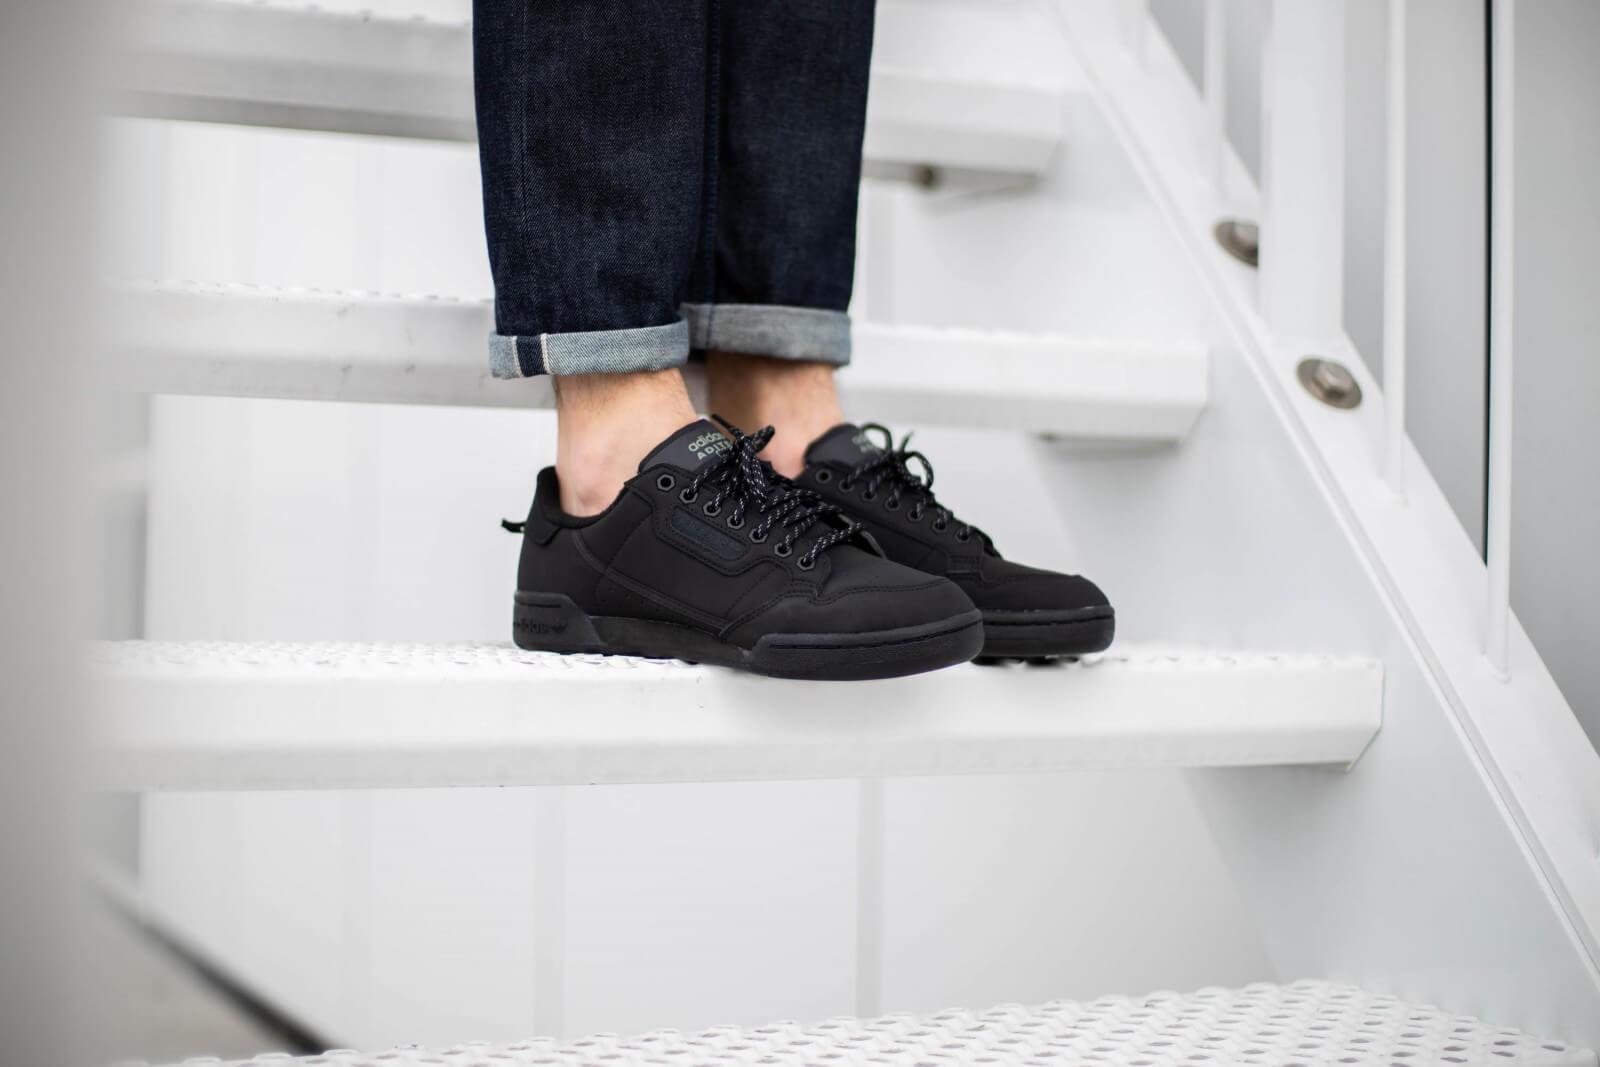 Adidas Continental 80 Core Black - FV4631